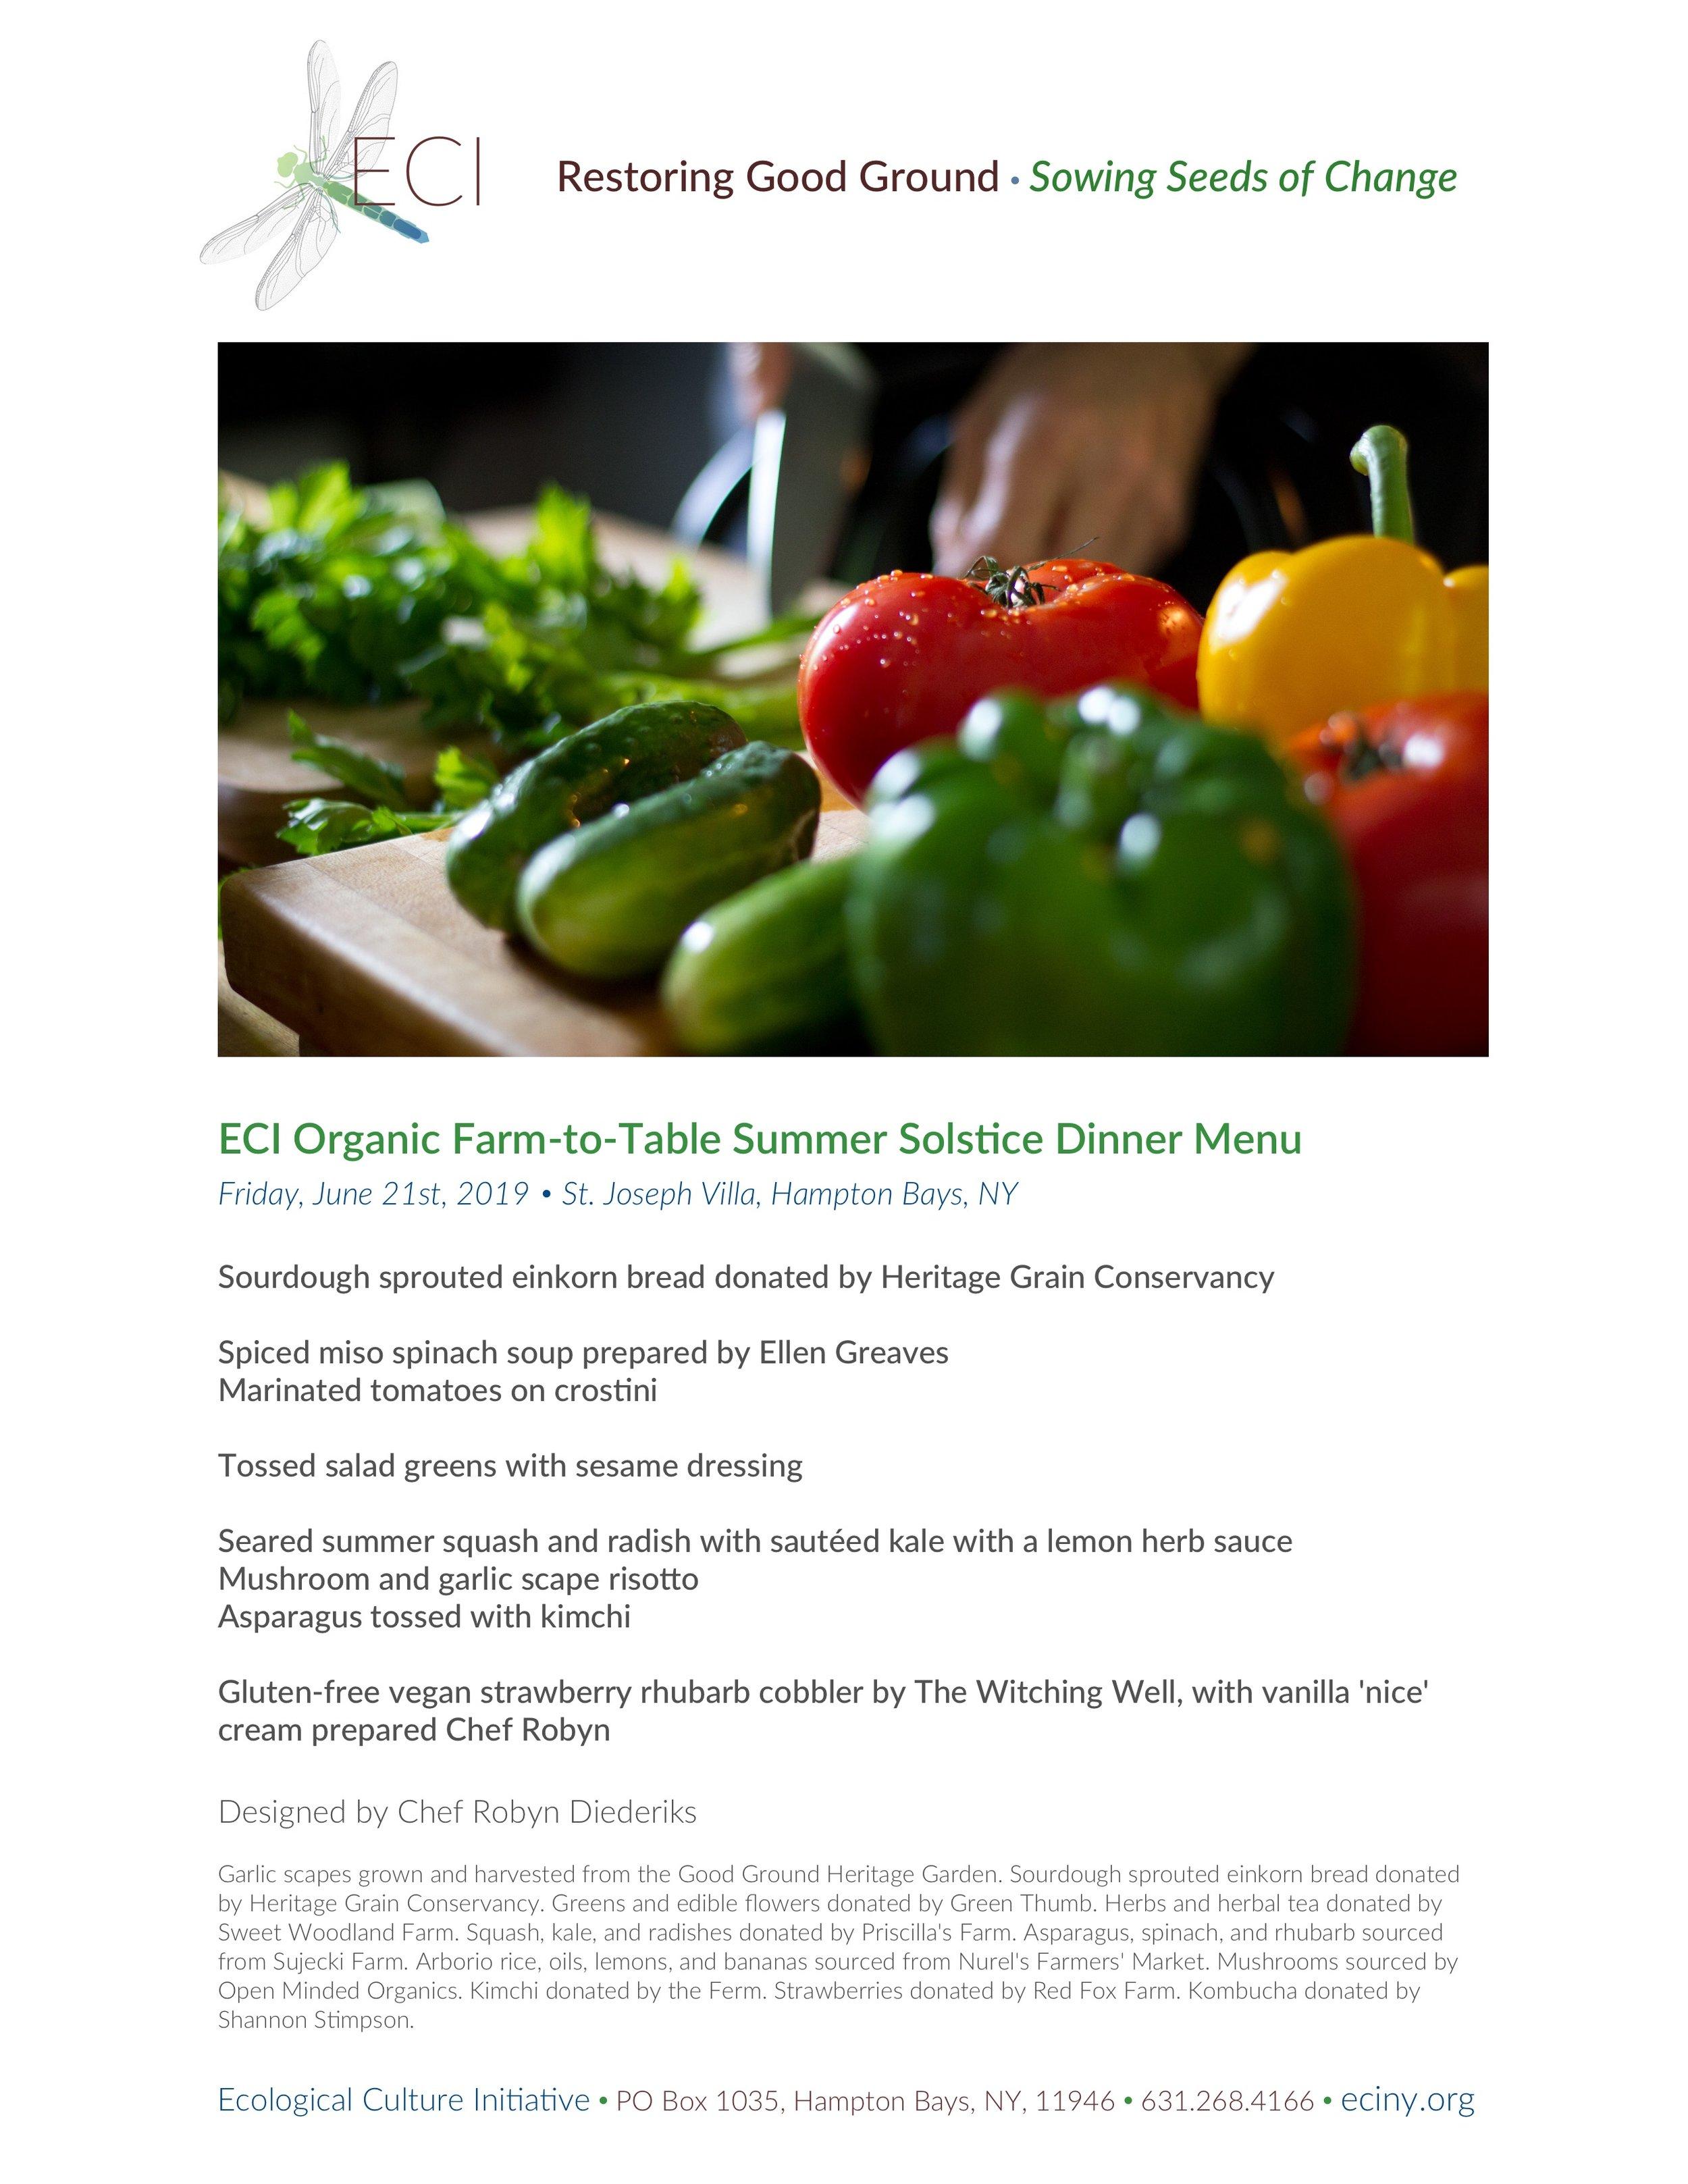 Organic Farm-to-Table Summer Solstice Dinner - Jun 21, 2019 - 8.5x11 menu.jpg